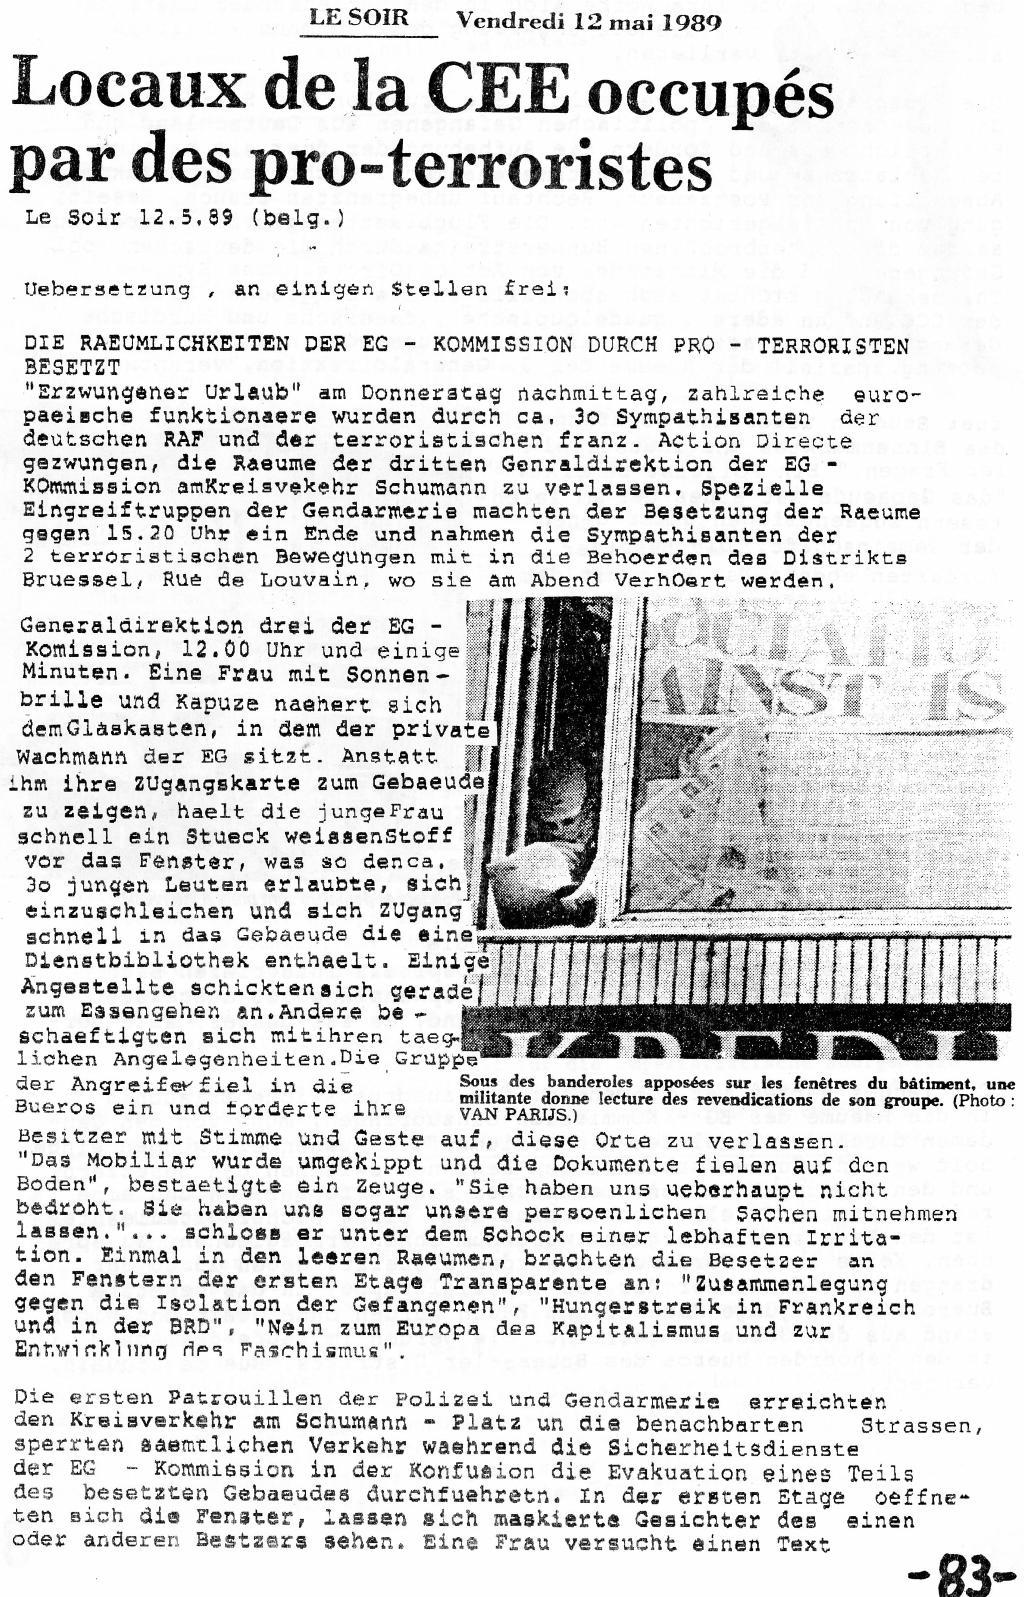 Belgien_Doku_Besetzung_EG_Kommission_1989_085